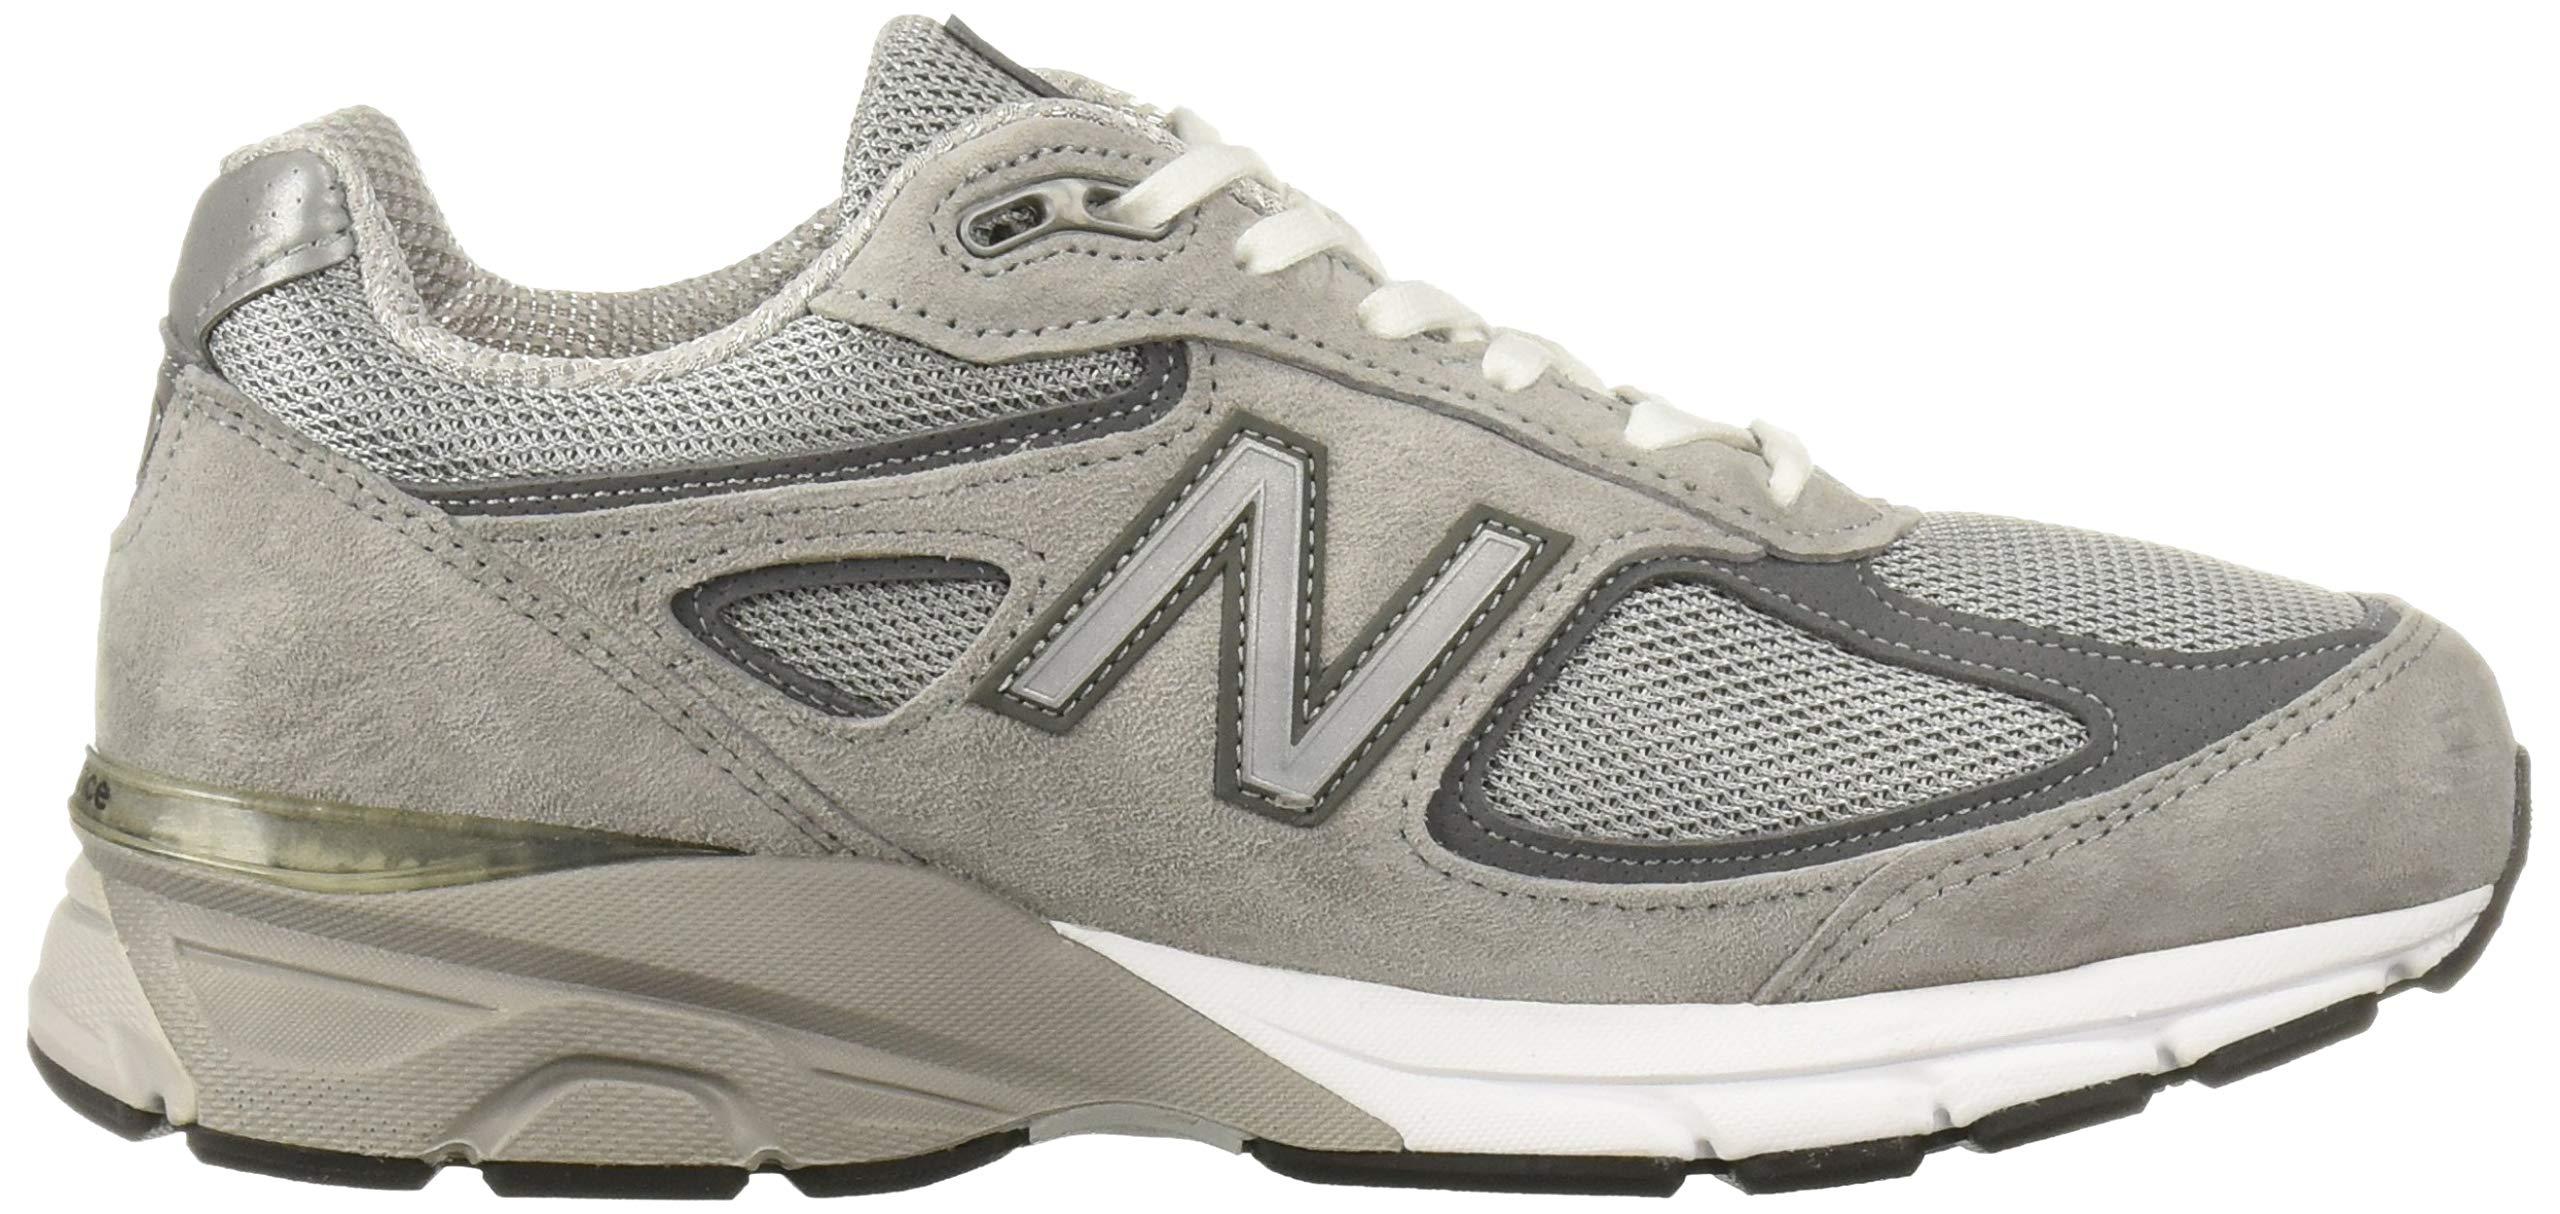 81VT e2XffL - New Balance Men's 990v4 Running Shoe